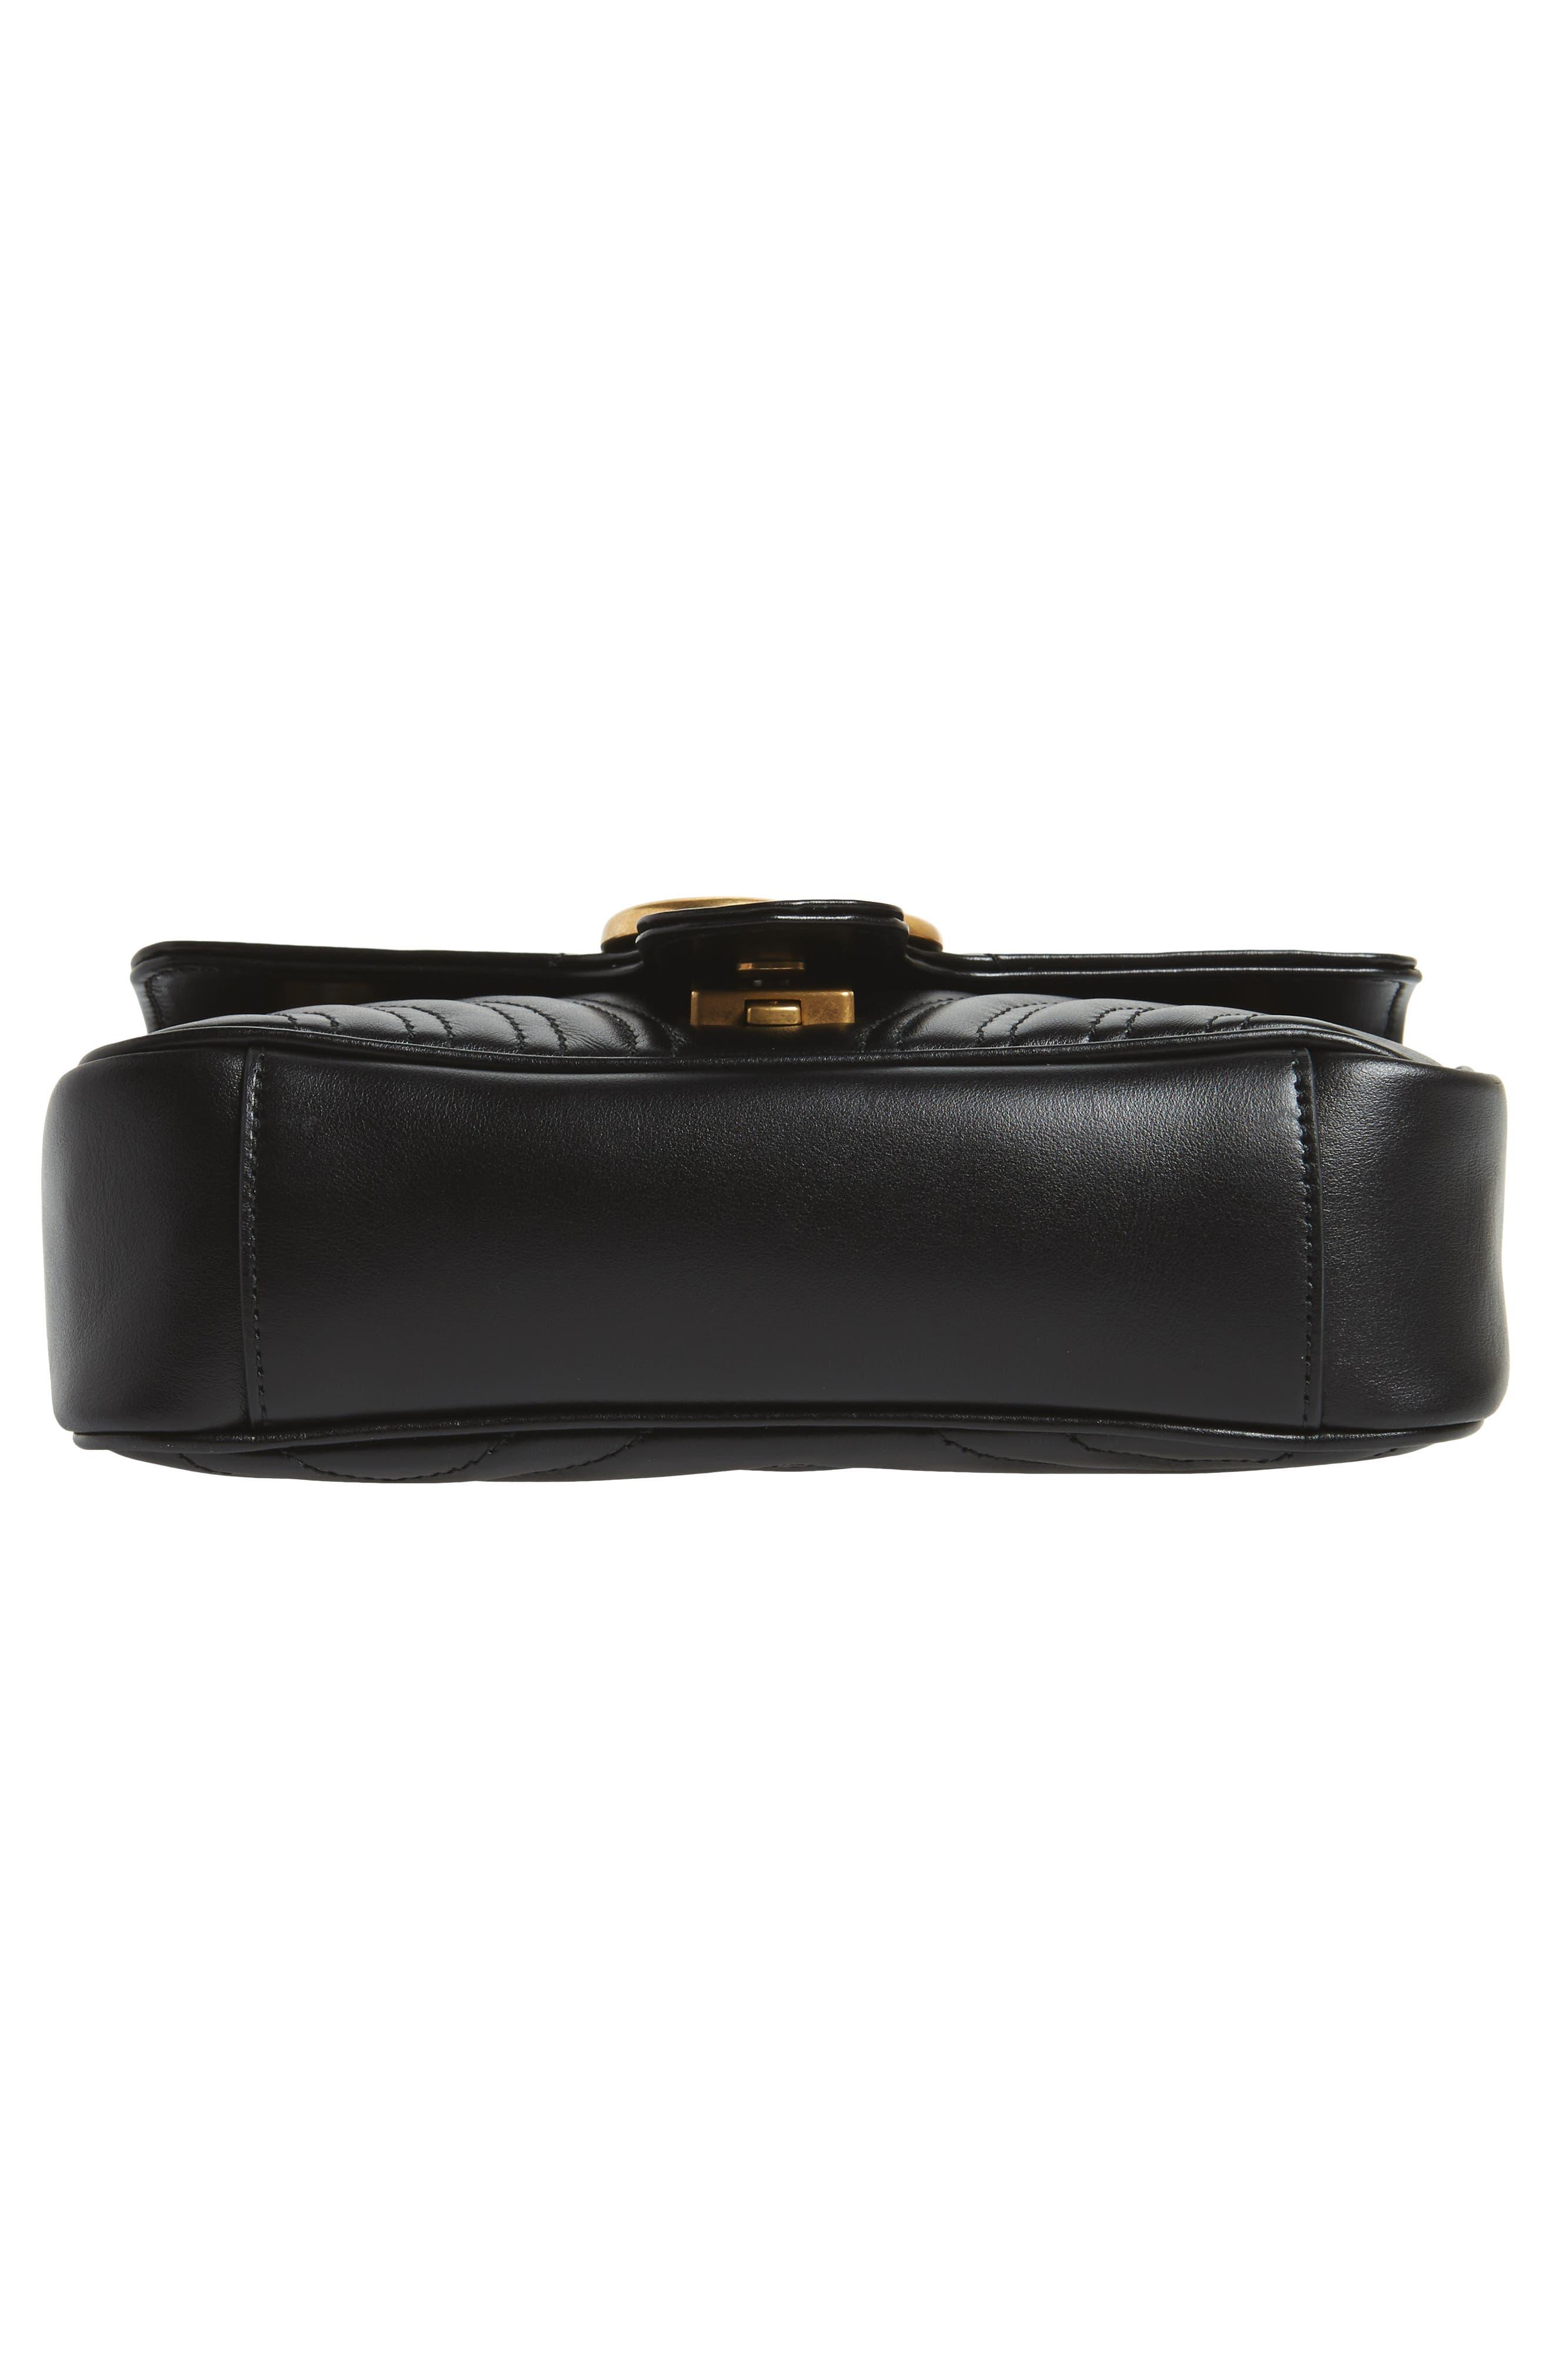 Mini GG Marmont 2.0 Matelassé Leather Shoulder Bag,                             Alternate thumbnail 6, color,                             NERO